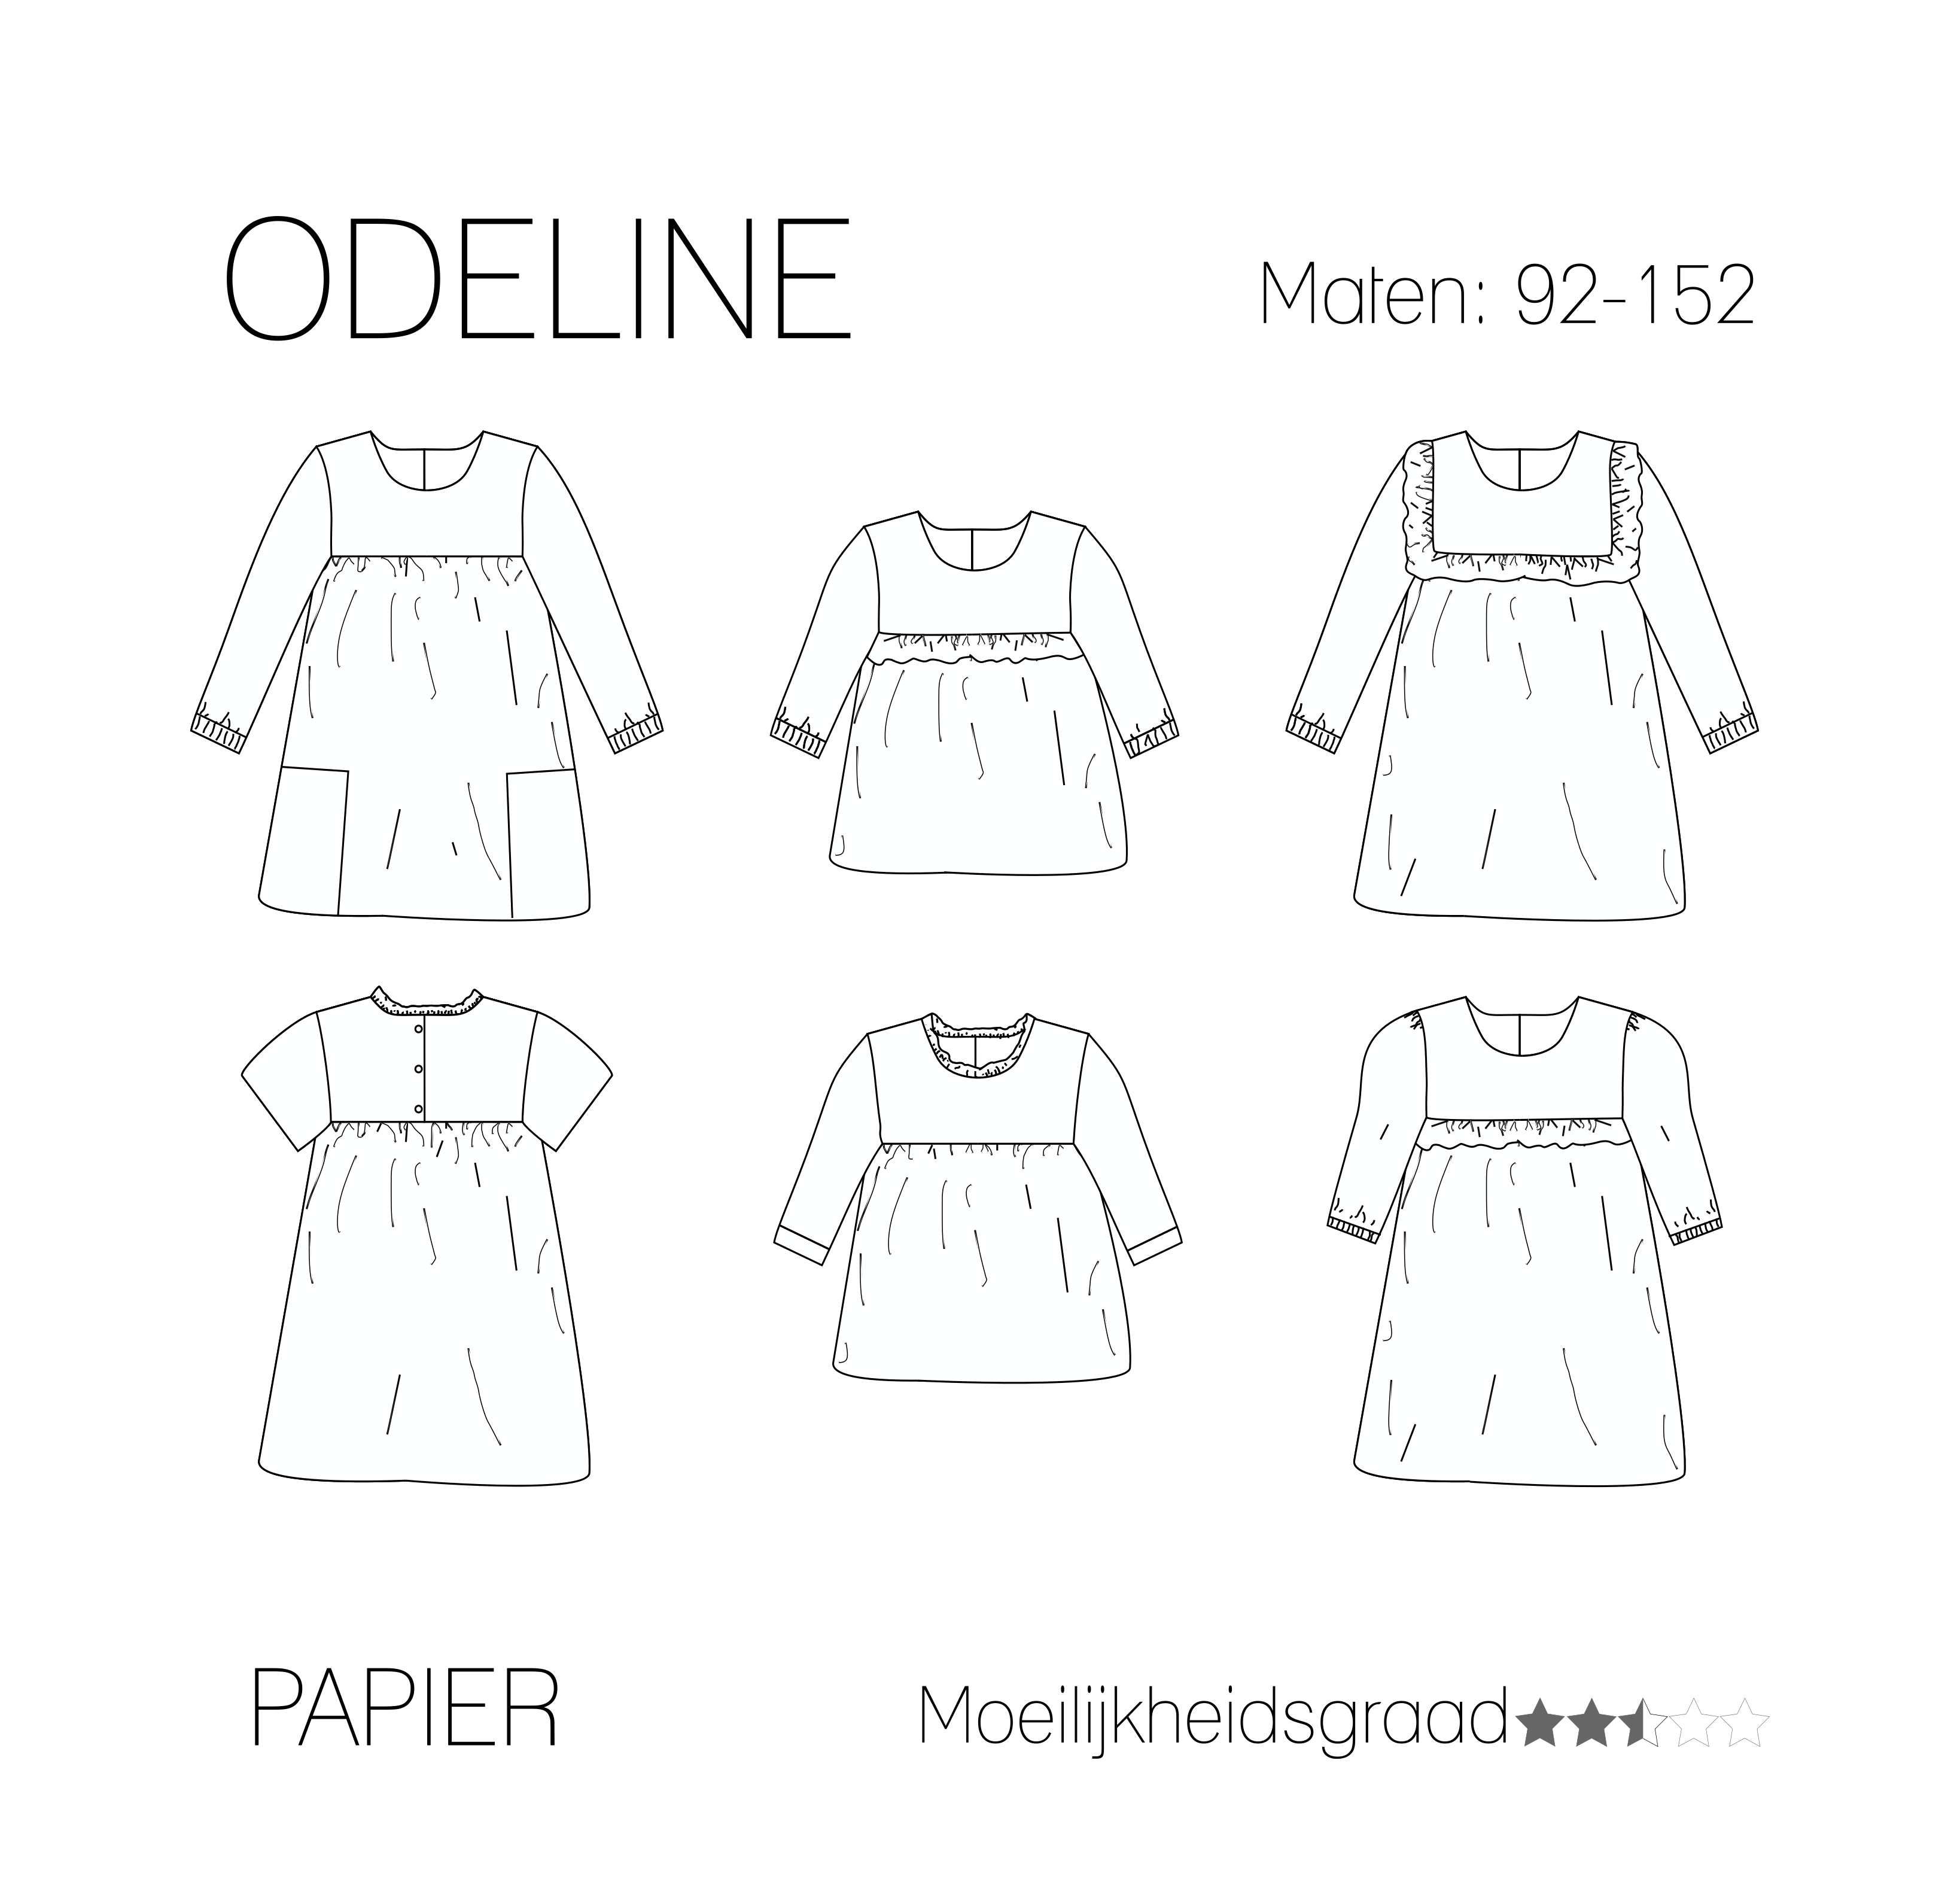 572b5a682c41b9 Odeline blouse jurk - Papieren patroon - Iris May